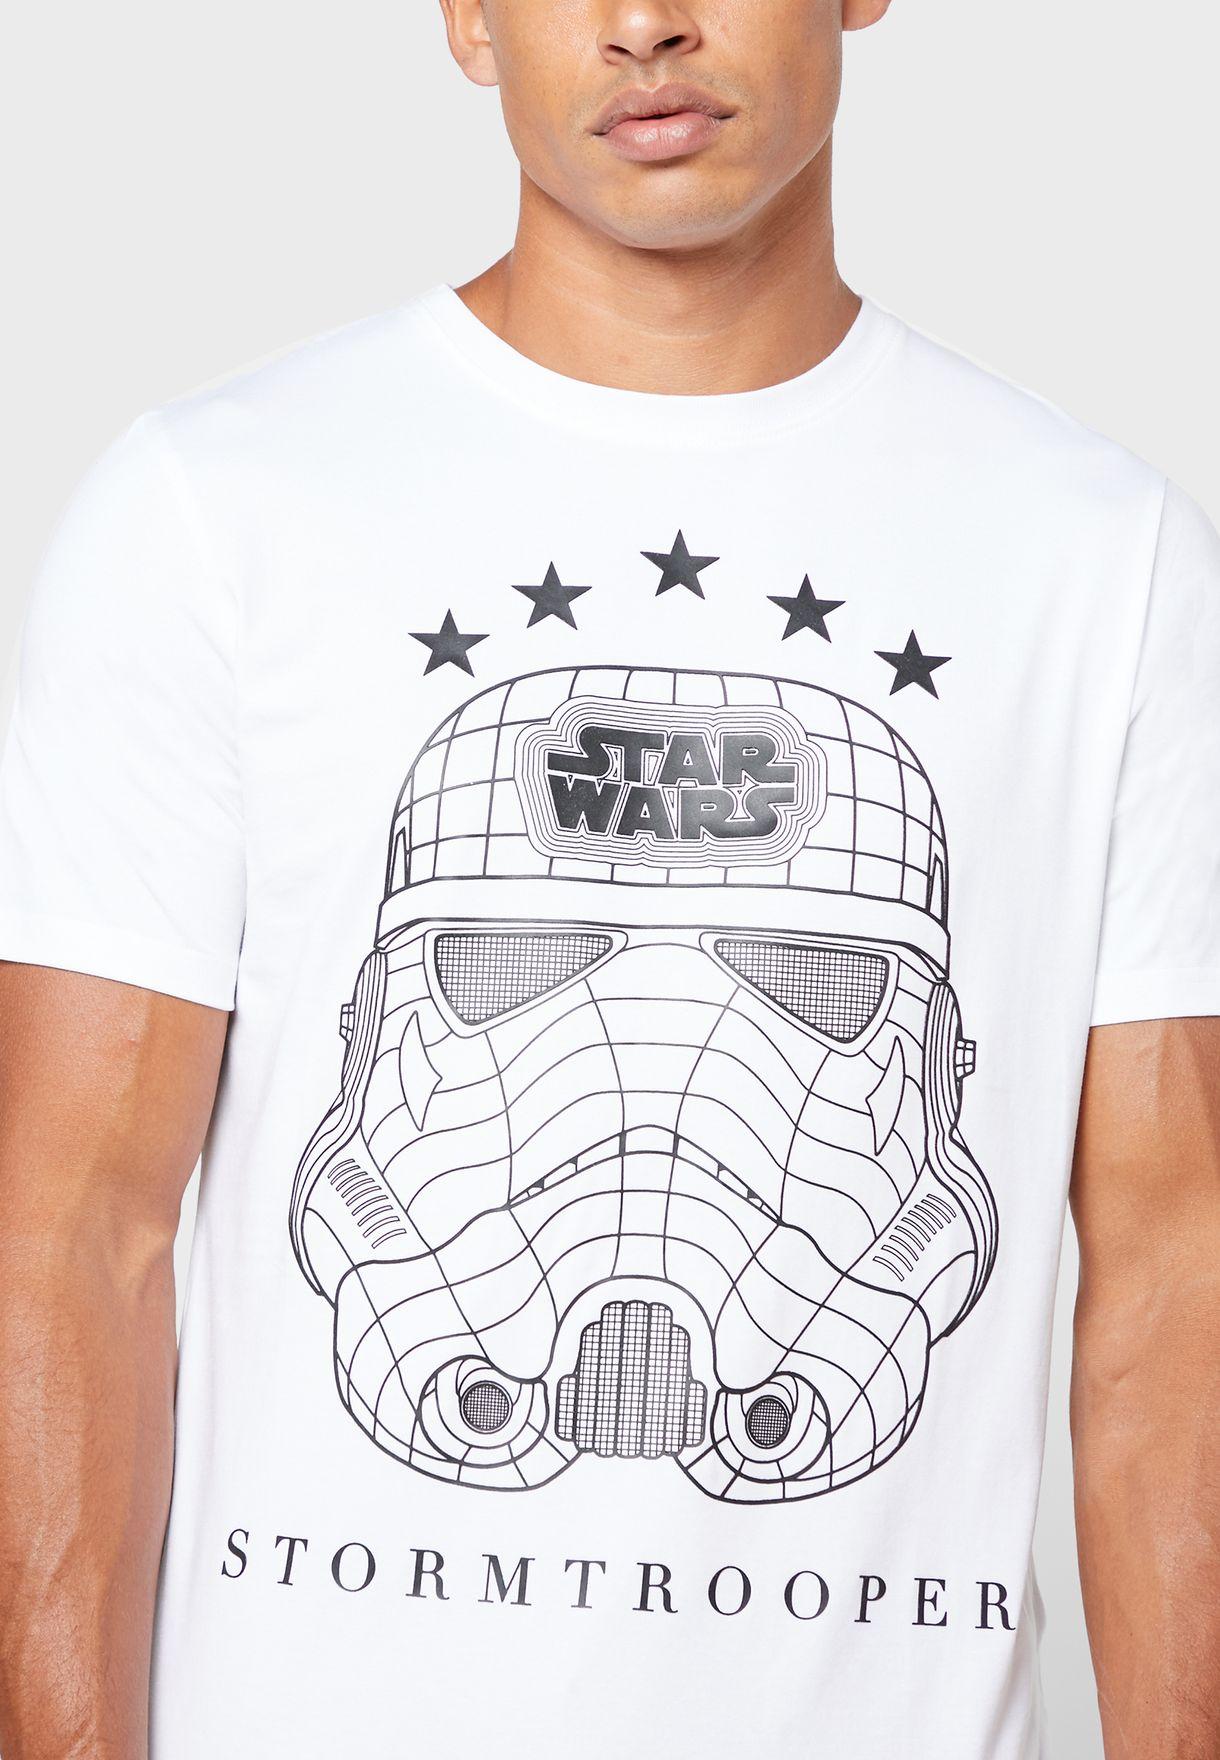 Storm Trooper Crew Neck T-Shirt